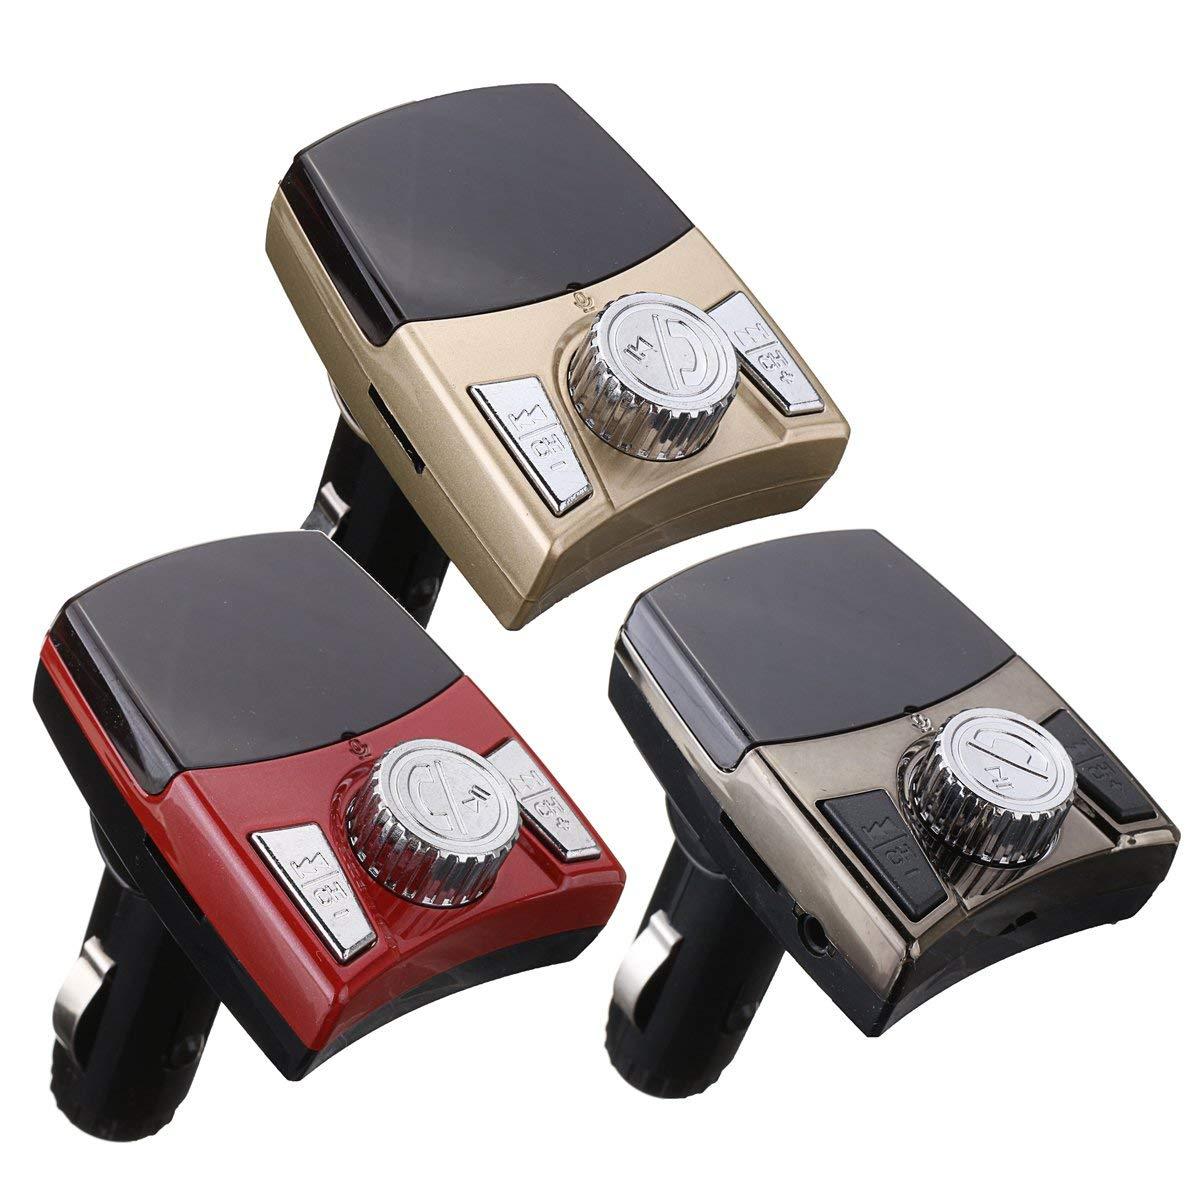 b233a87261056f Get Quotations · MAUBHYA Bluetooth Car FM Transmitter Wireless Radio  Adapter USB Charger Mp3 Player